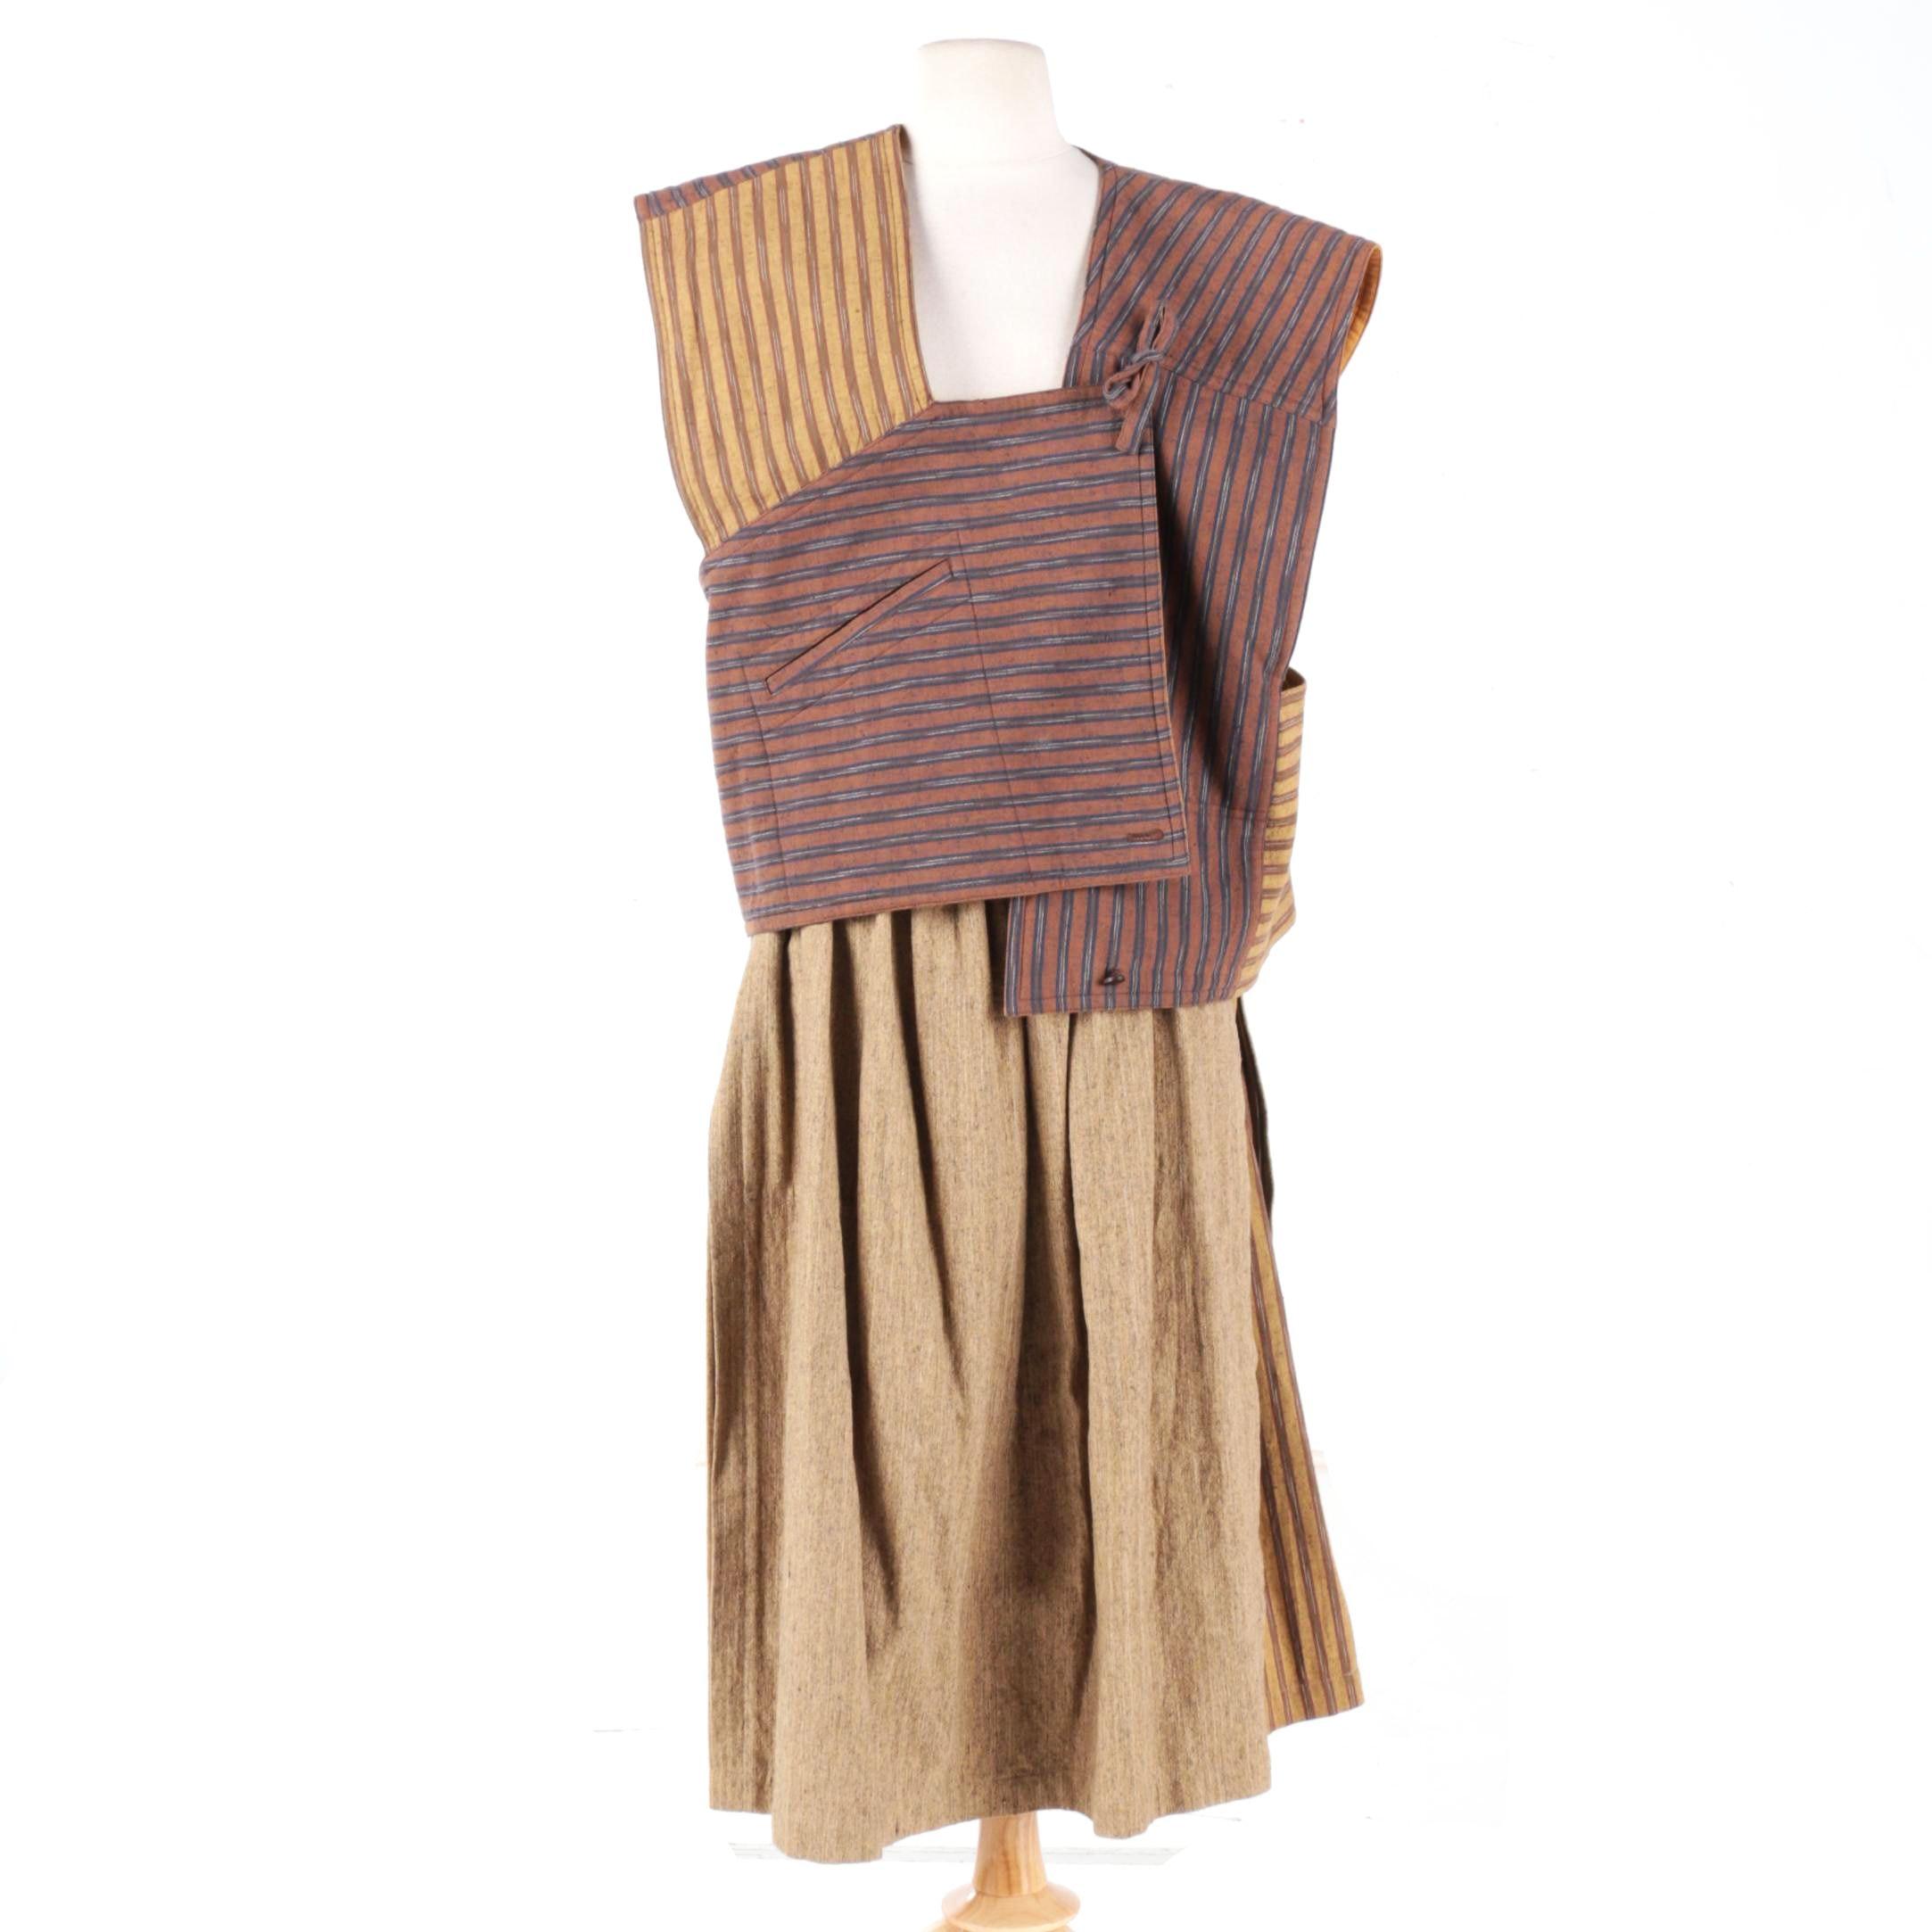 Women's Issey Miyake Plantation Skirt and Top Set